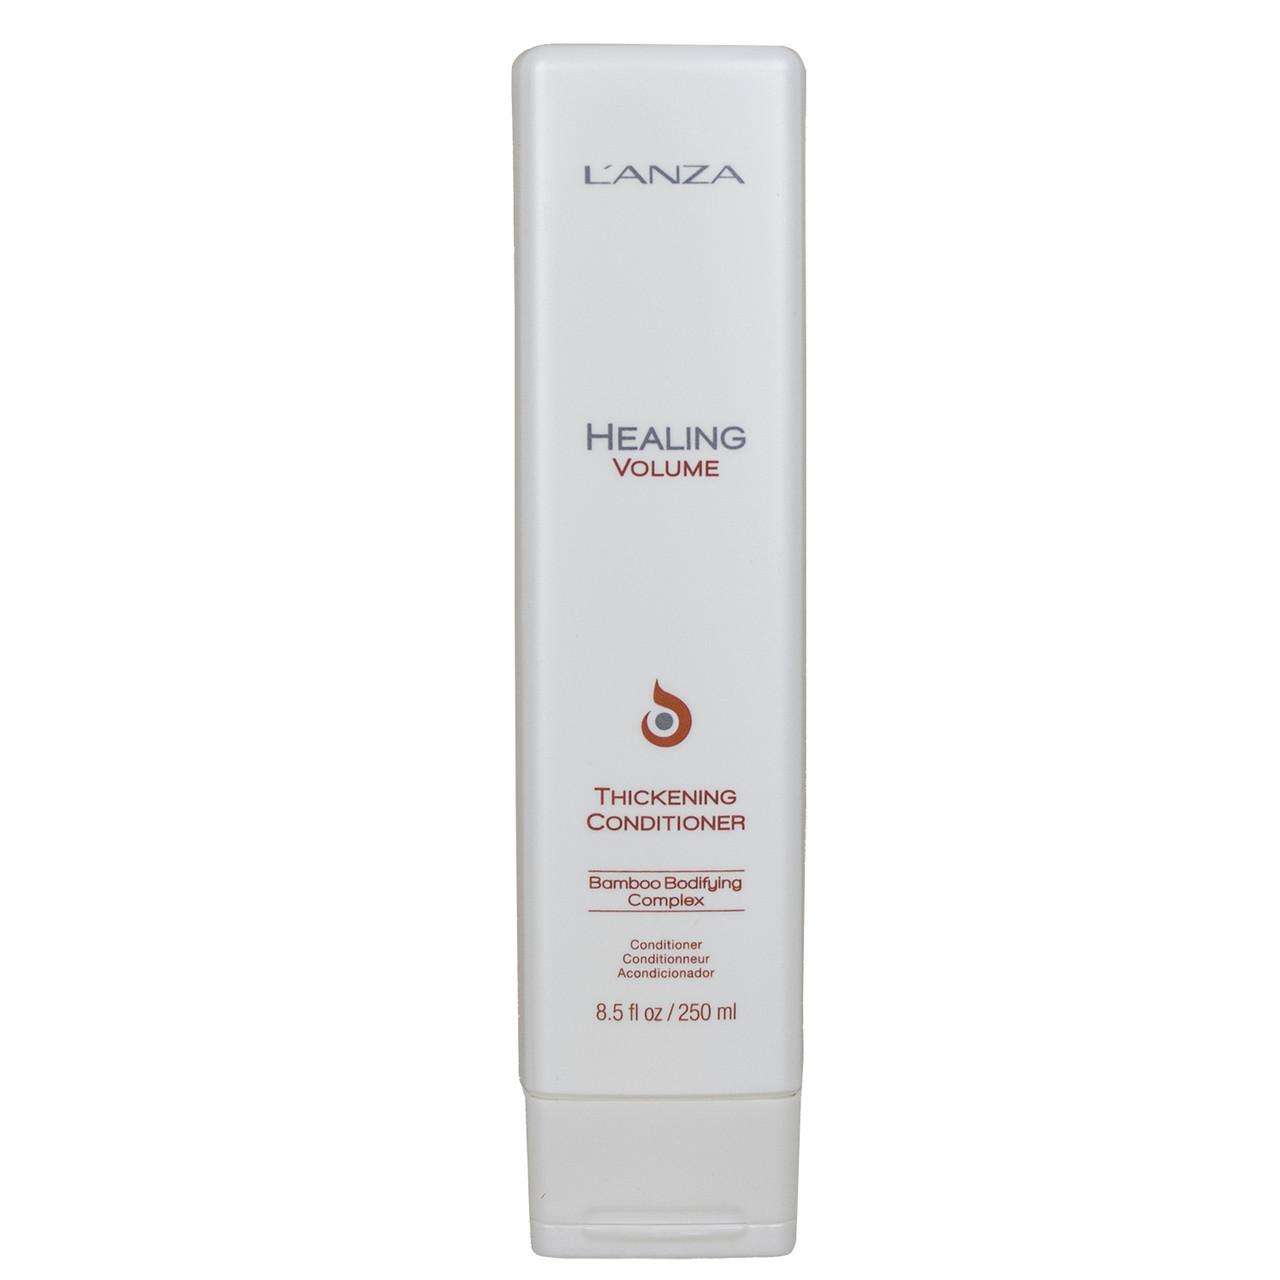 Lanza healing volume thickening conditioner Кондиционер для наполнения и объема волос ph: 5.4, 250 мл